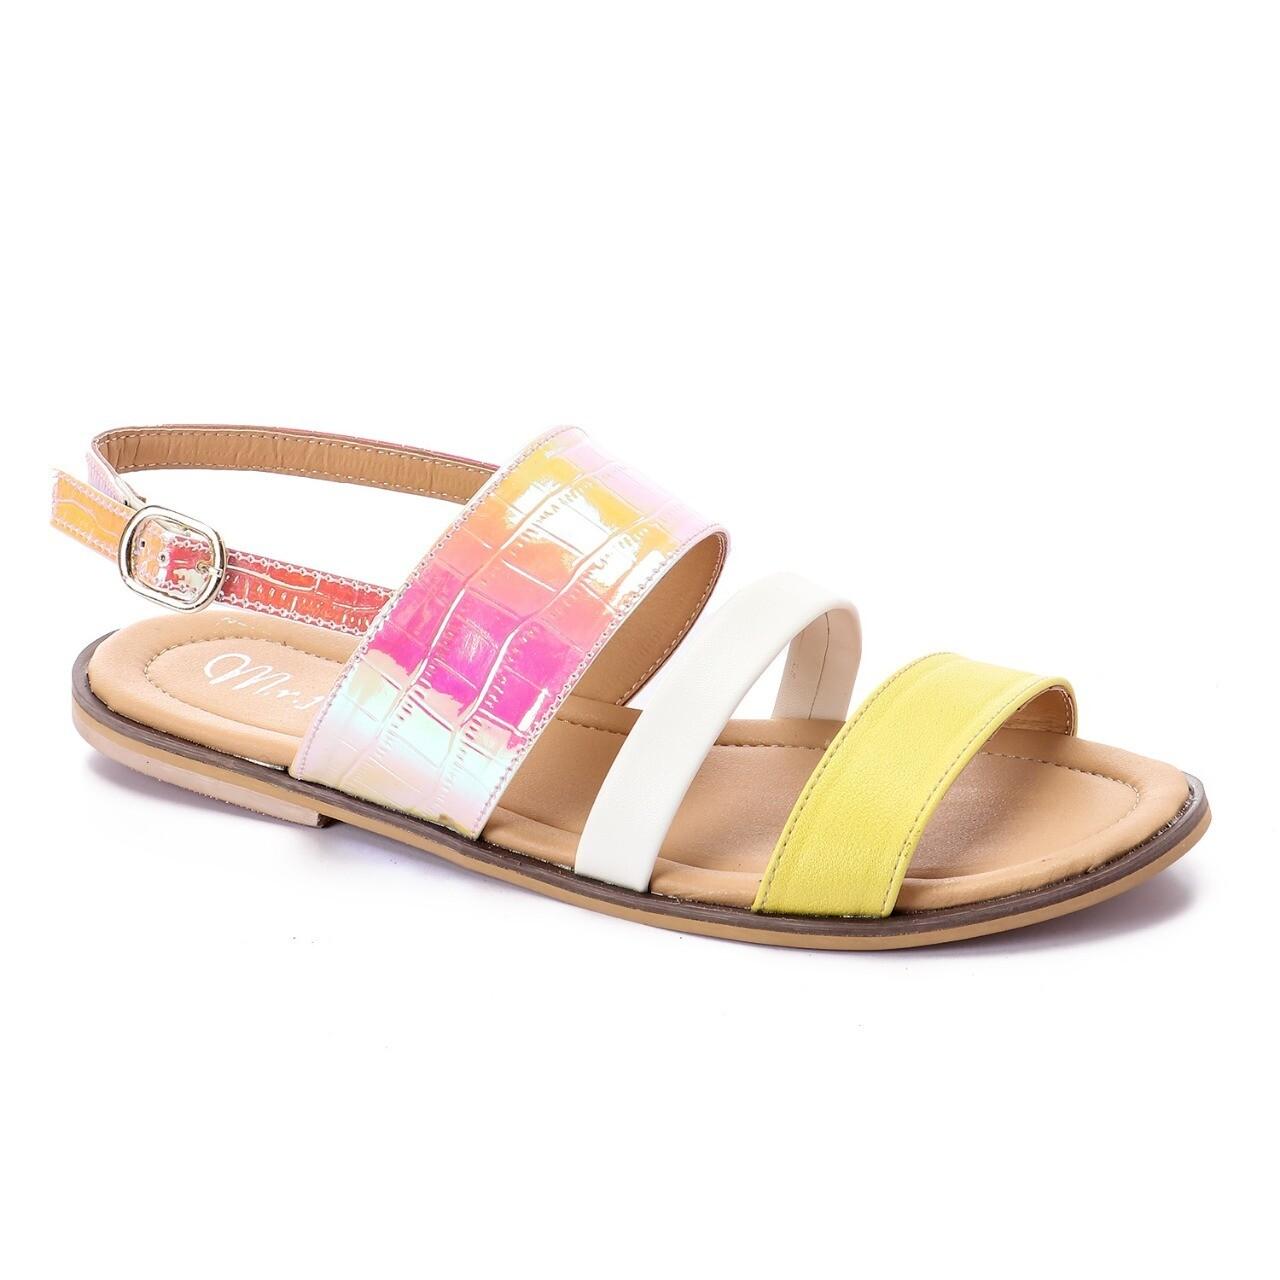 3468 Sandal - light yellow